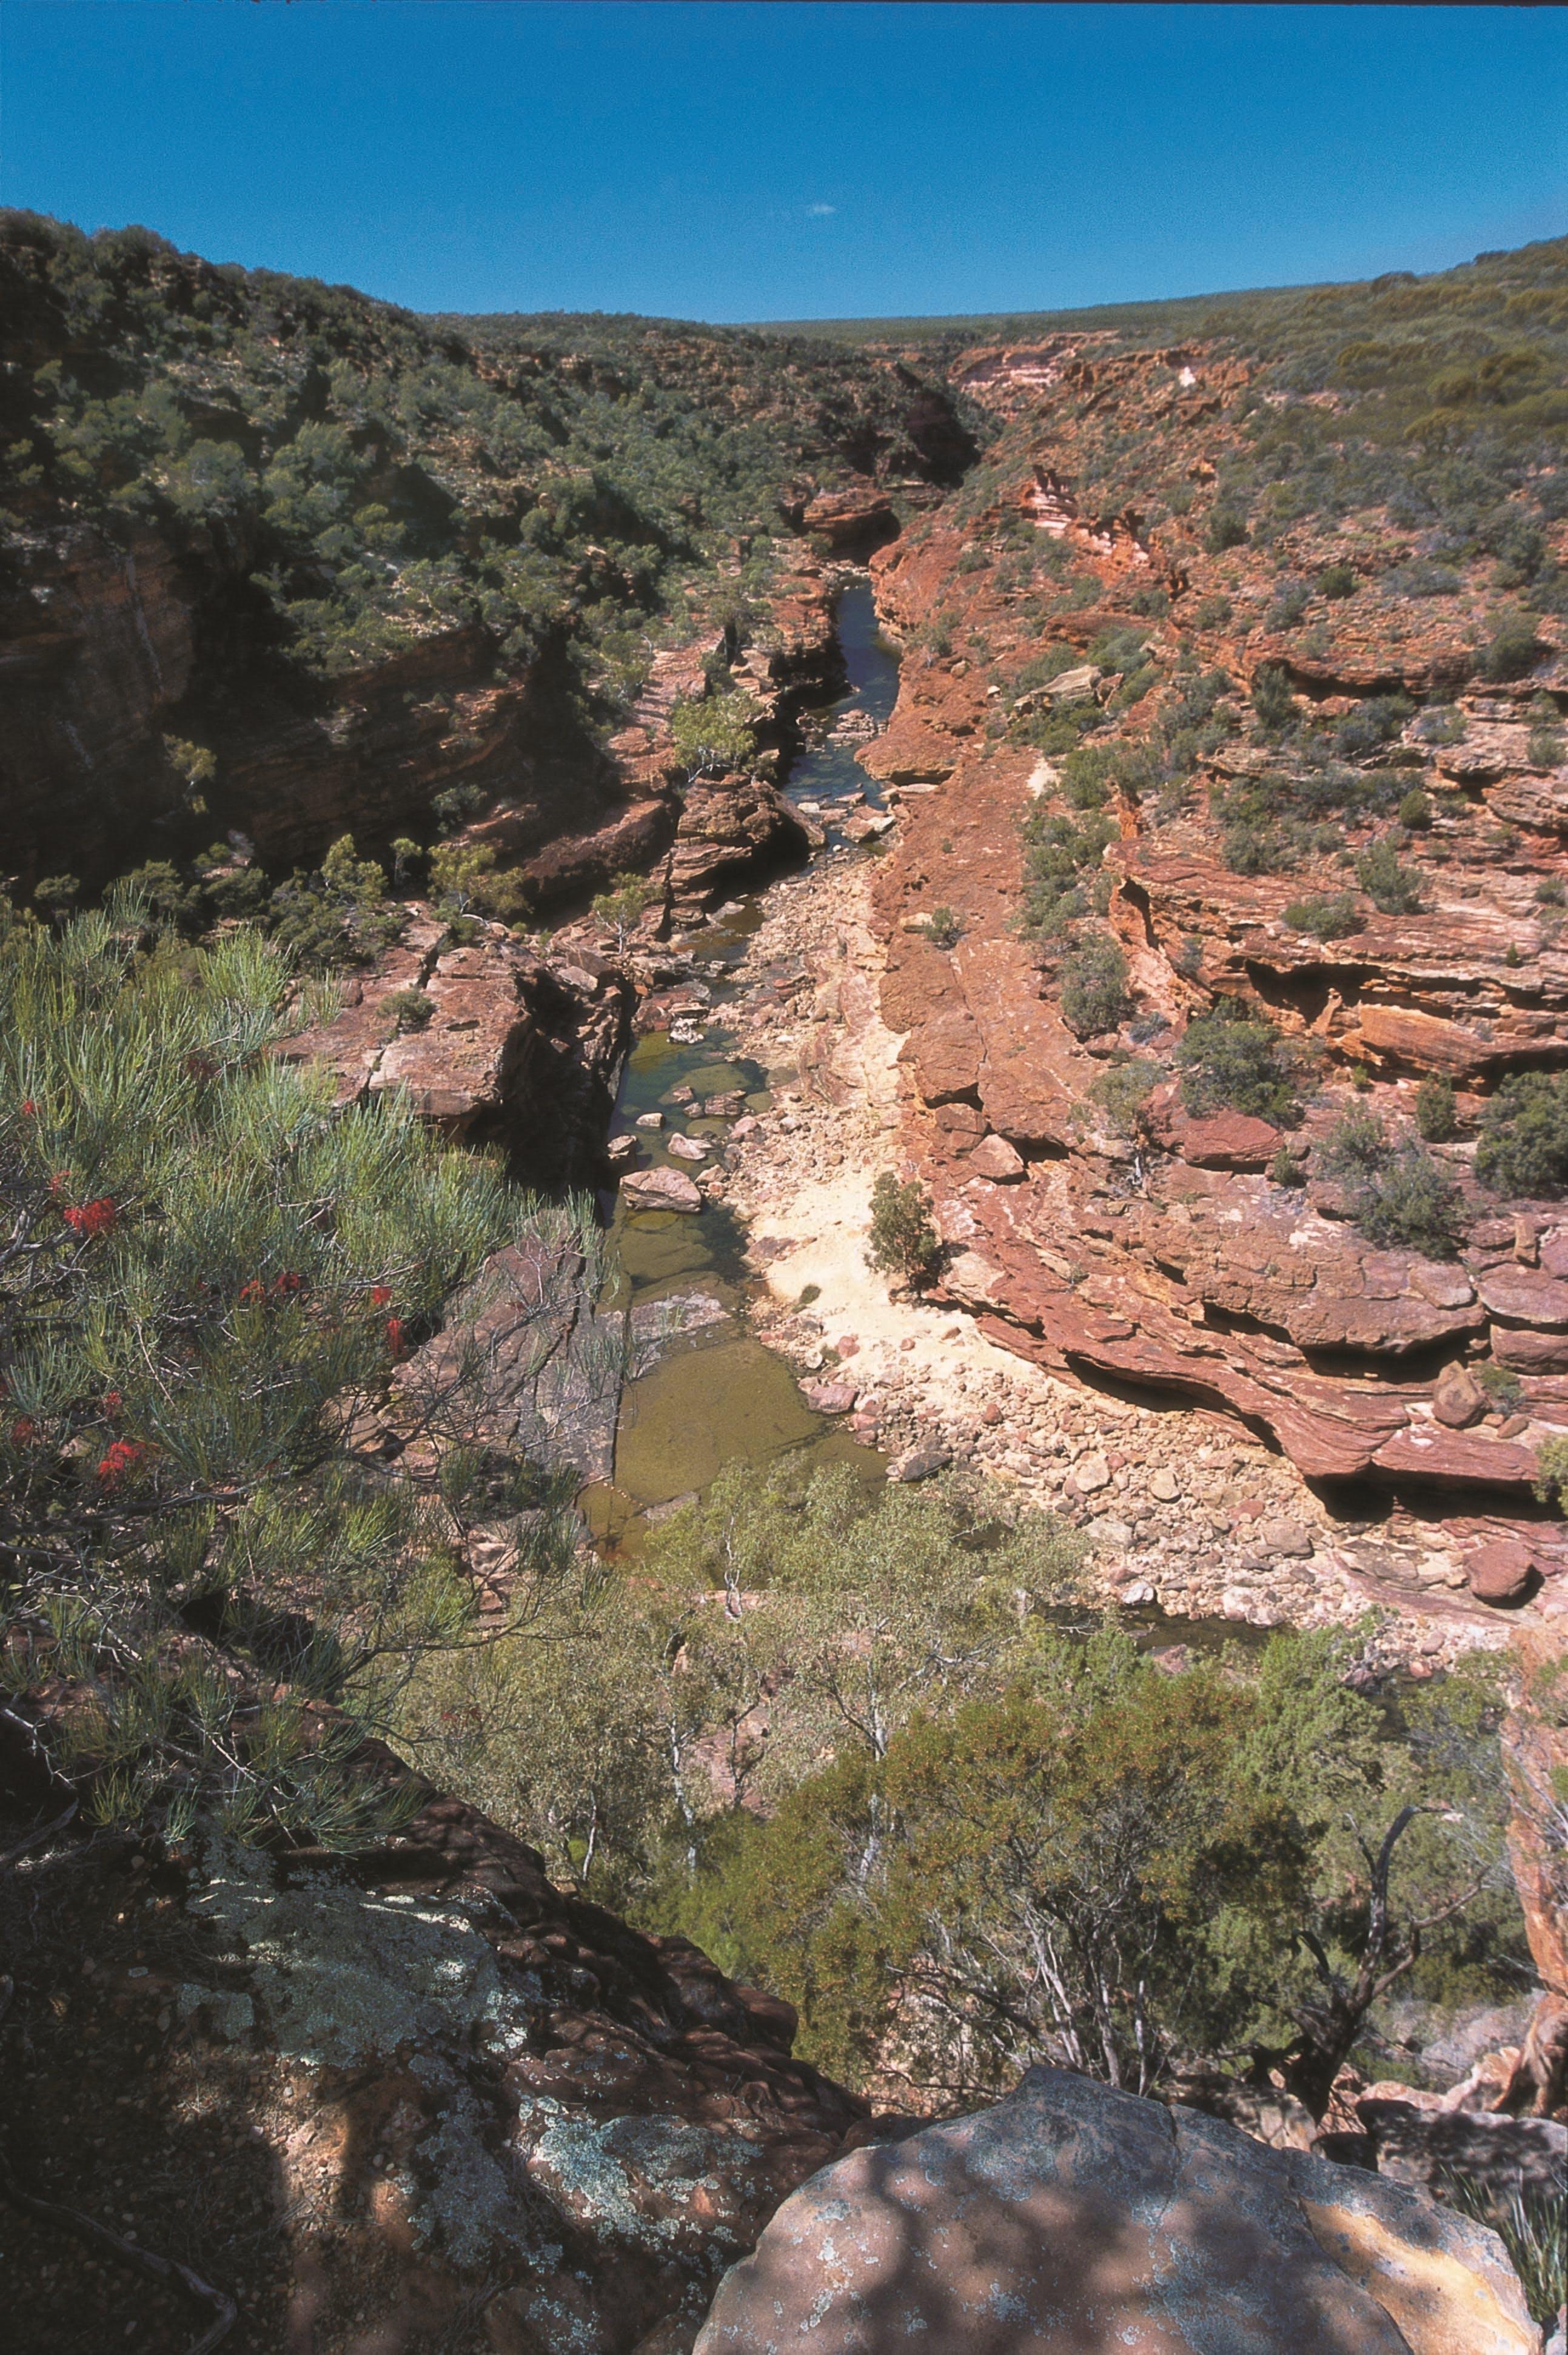 Ross Graham Lookout, Kalbarri, Western Australia